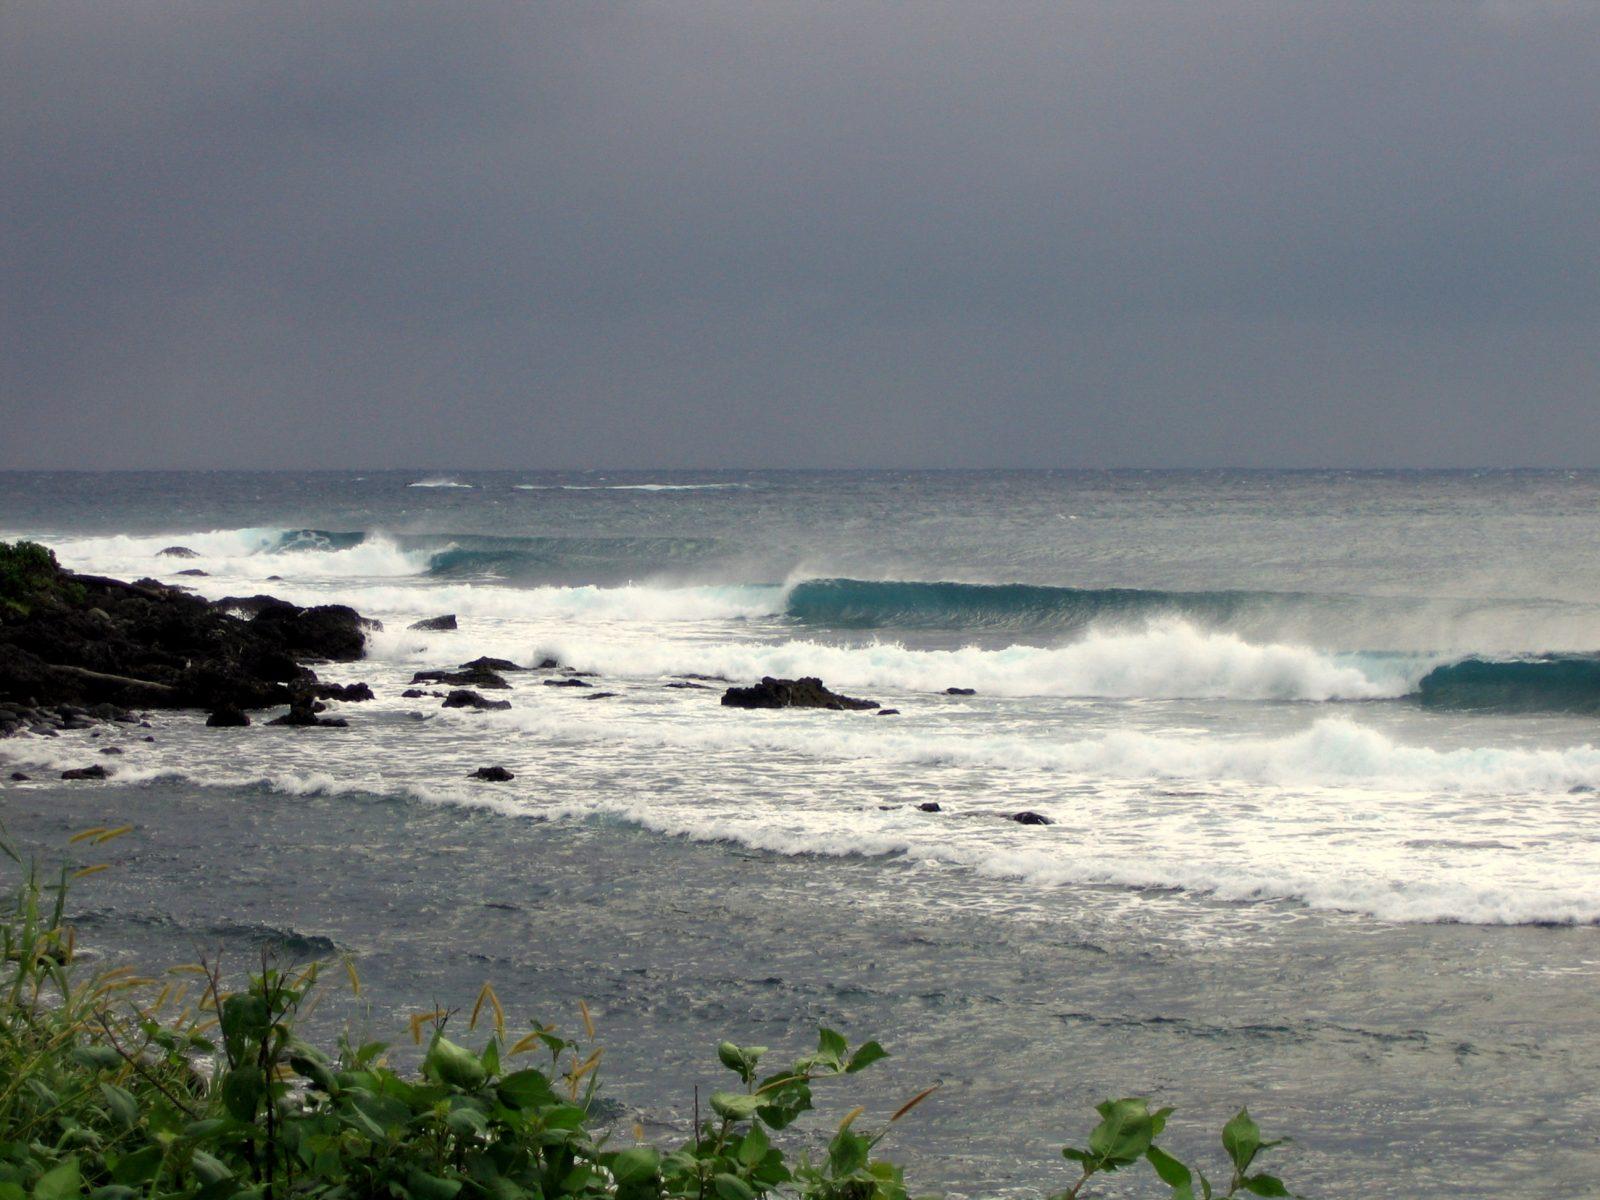 wagaligong-surf-hostel-dulan-chenggong-e1465160295823